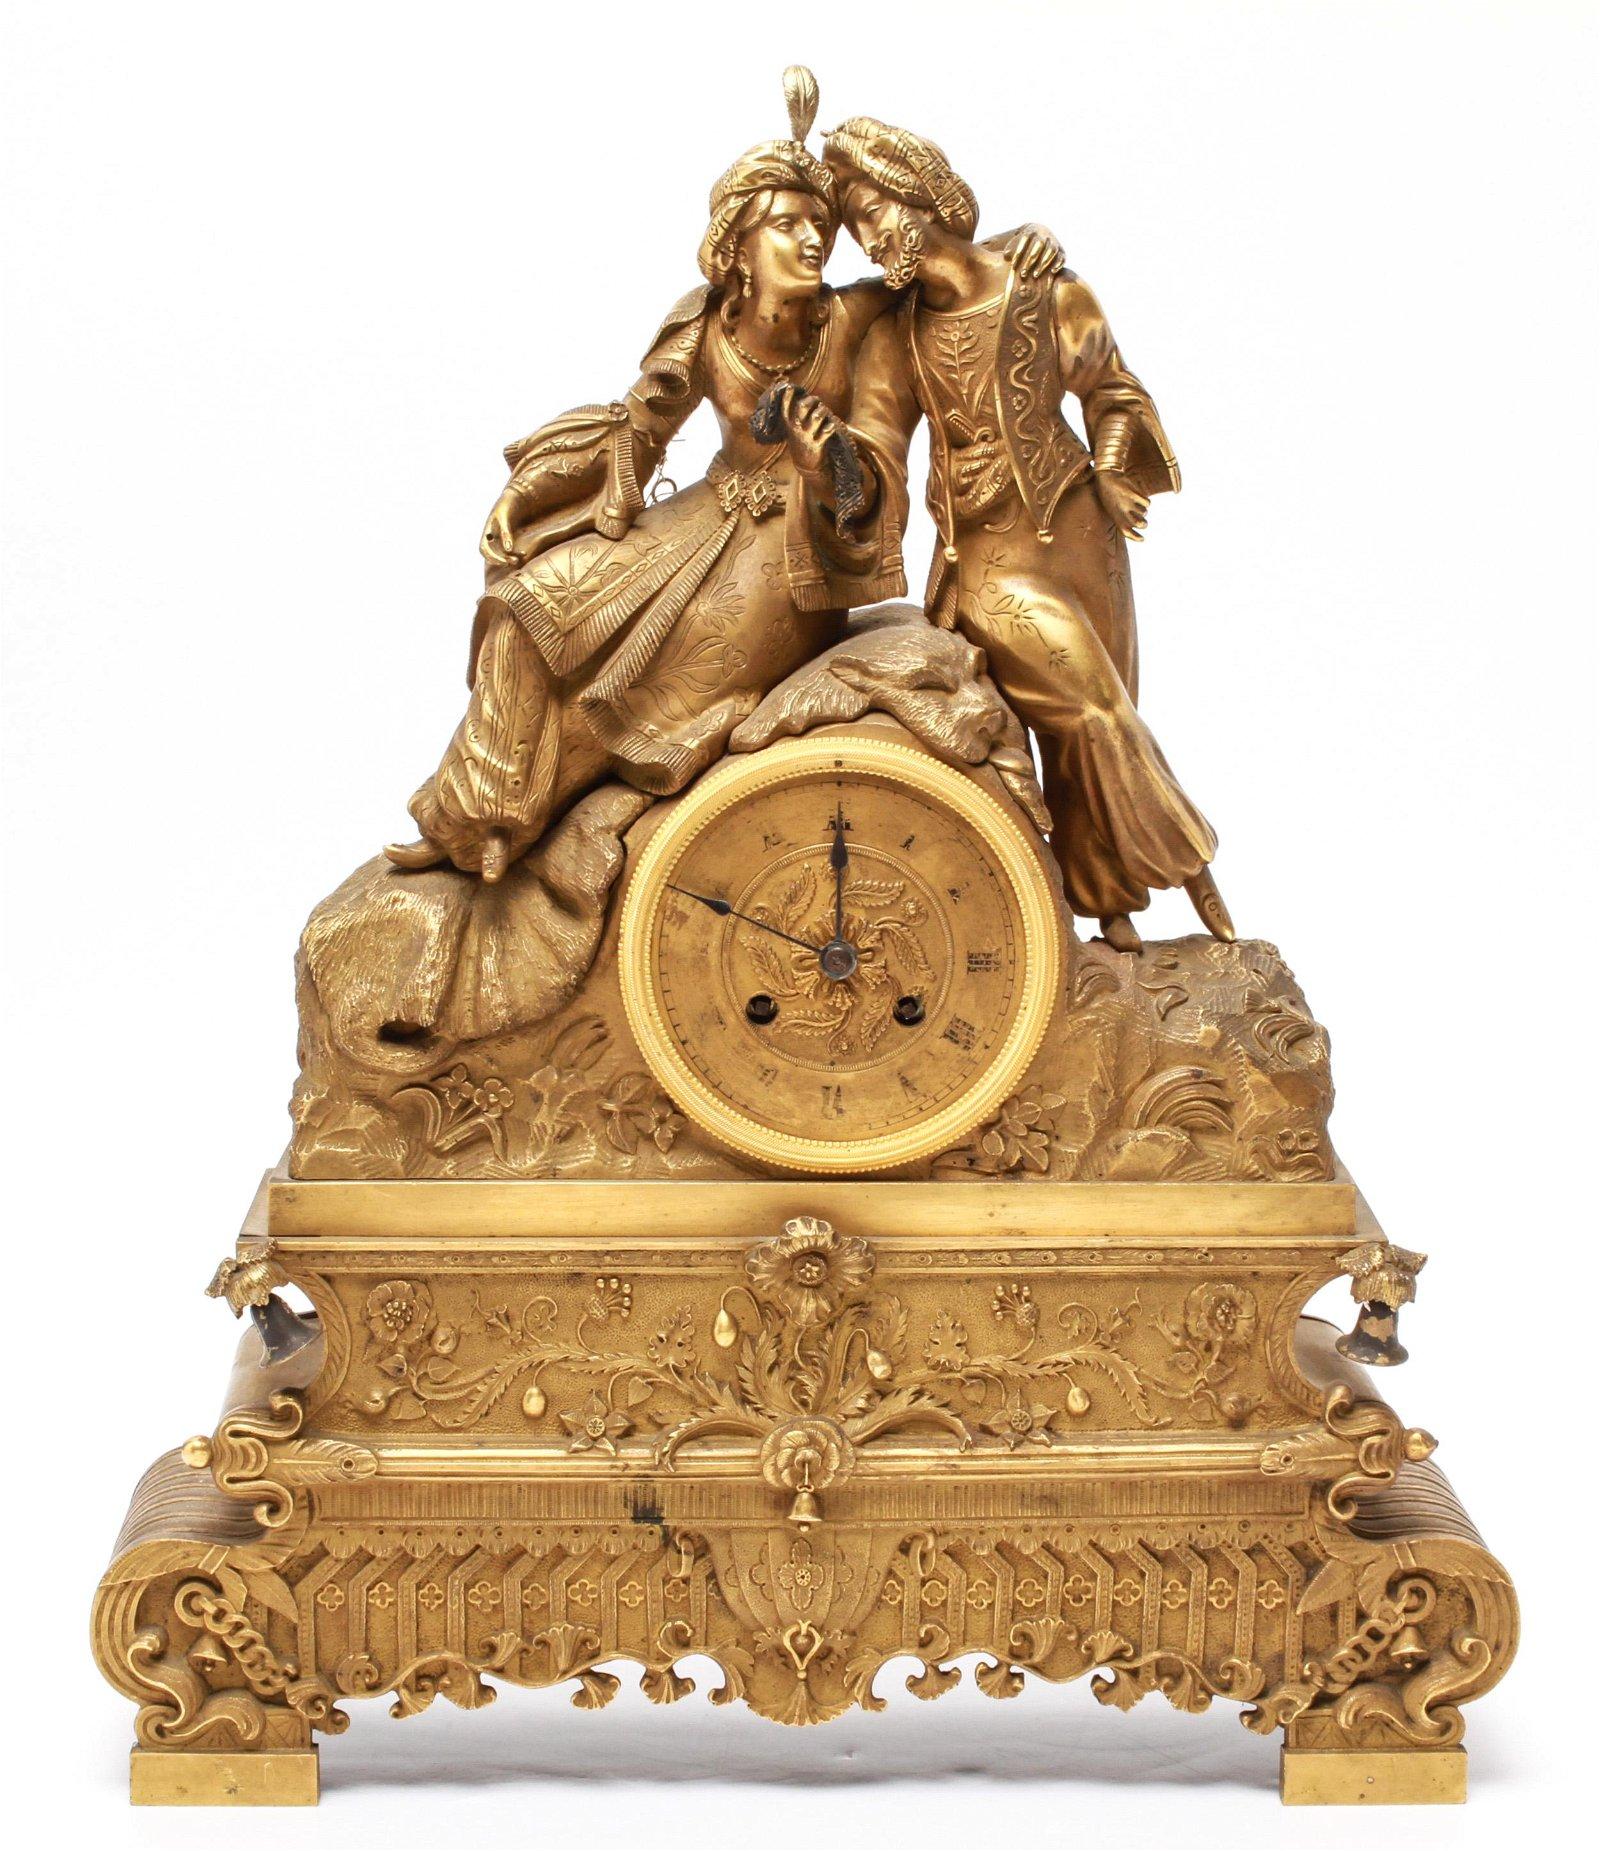 Orientalist Gilt-Bronze Figurative Mantel Clock